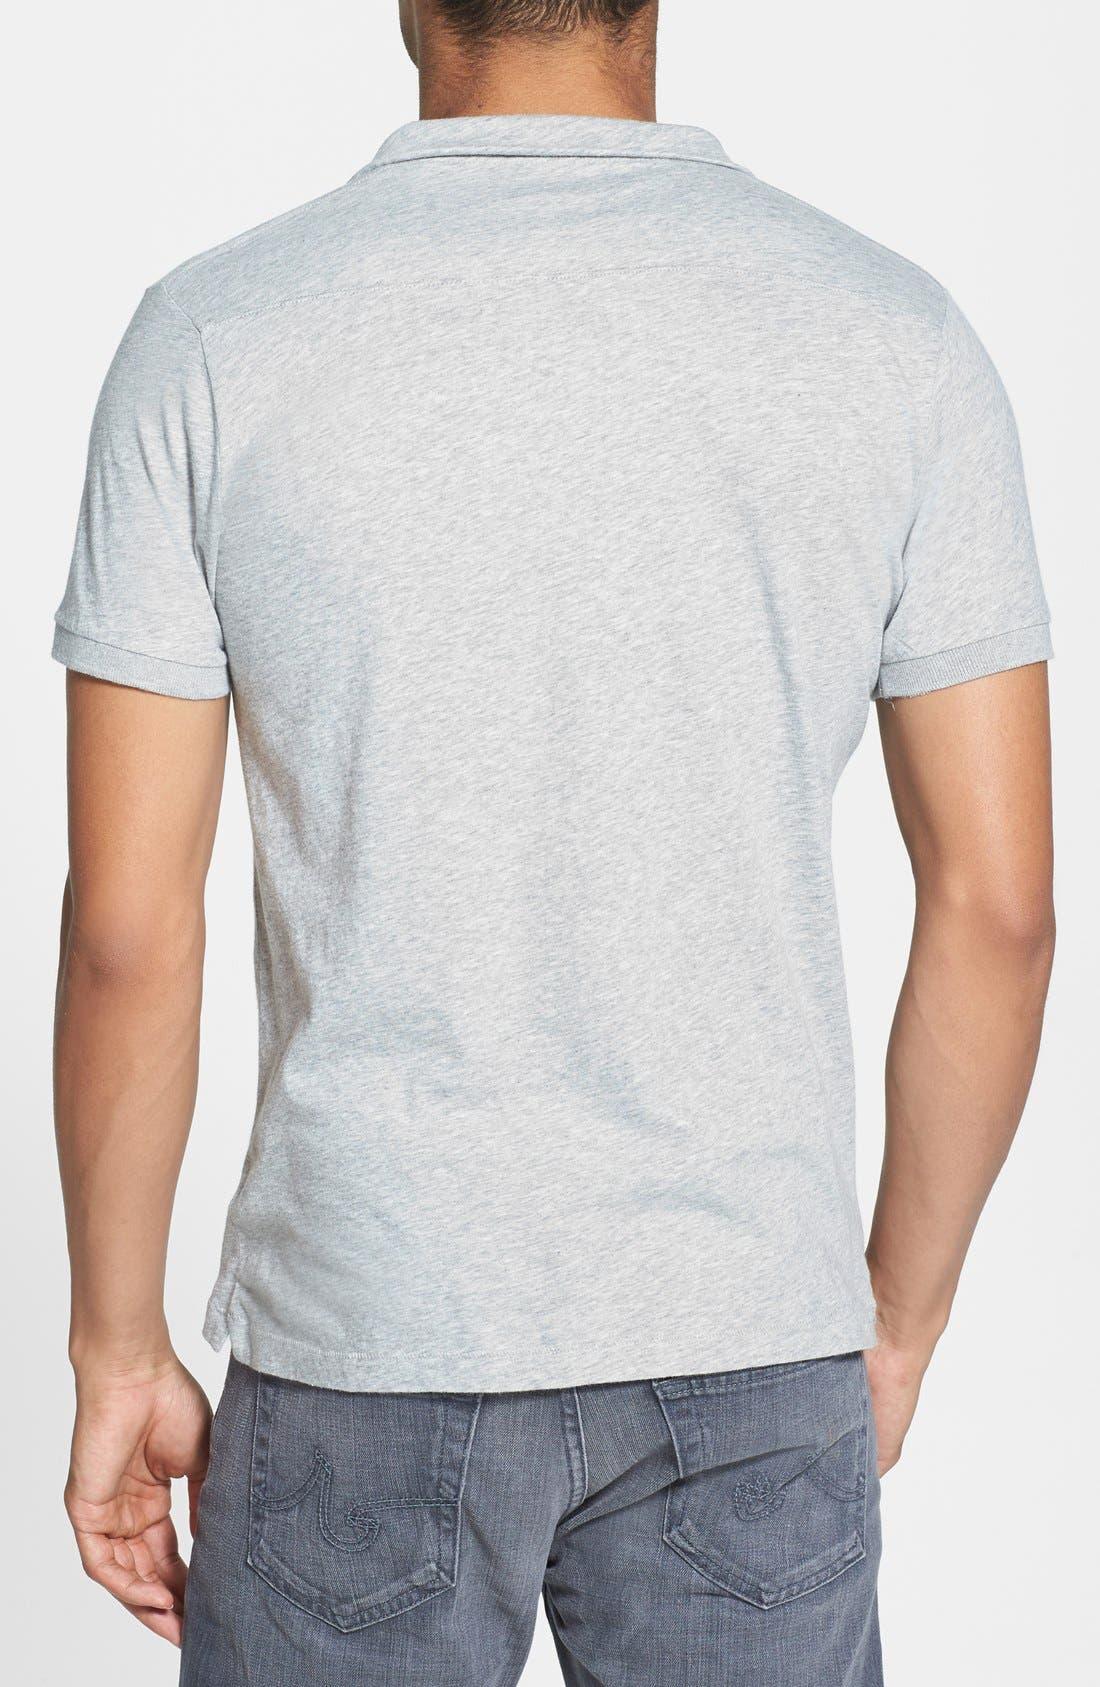 Alternate Image 2  - French Connection 'Lunar' Slim Fit V-Neck Jersey Polo Shirt